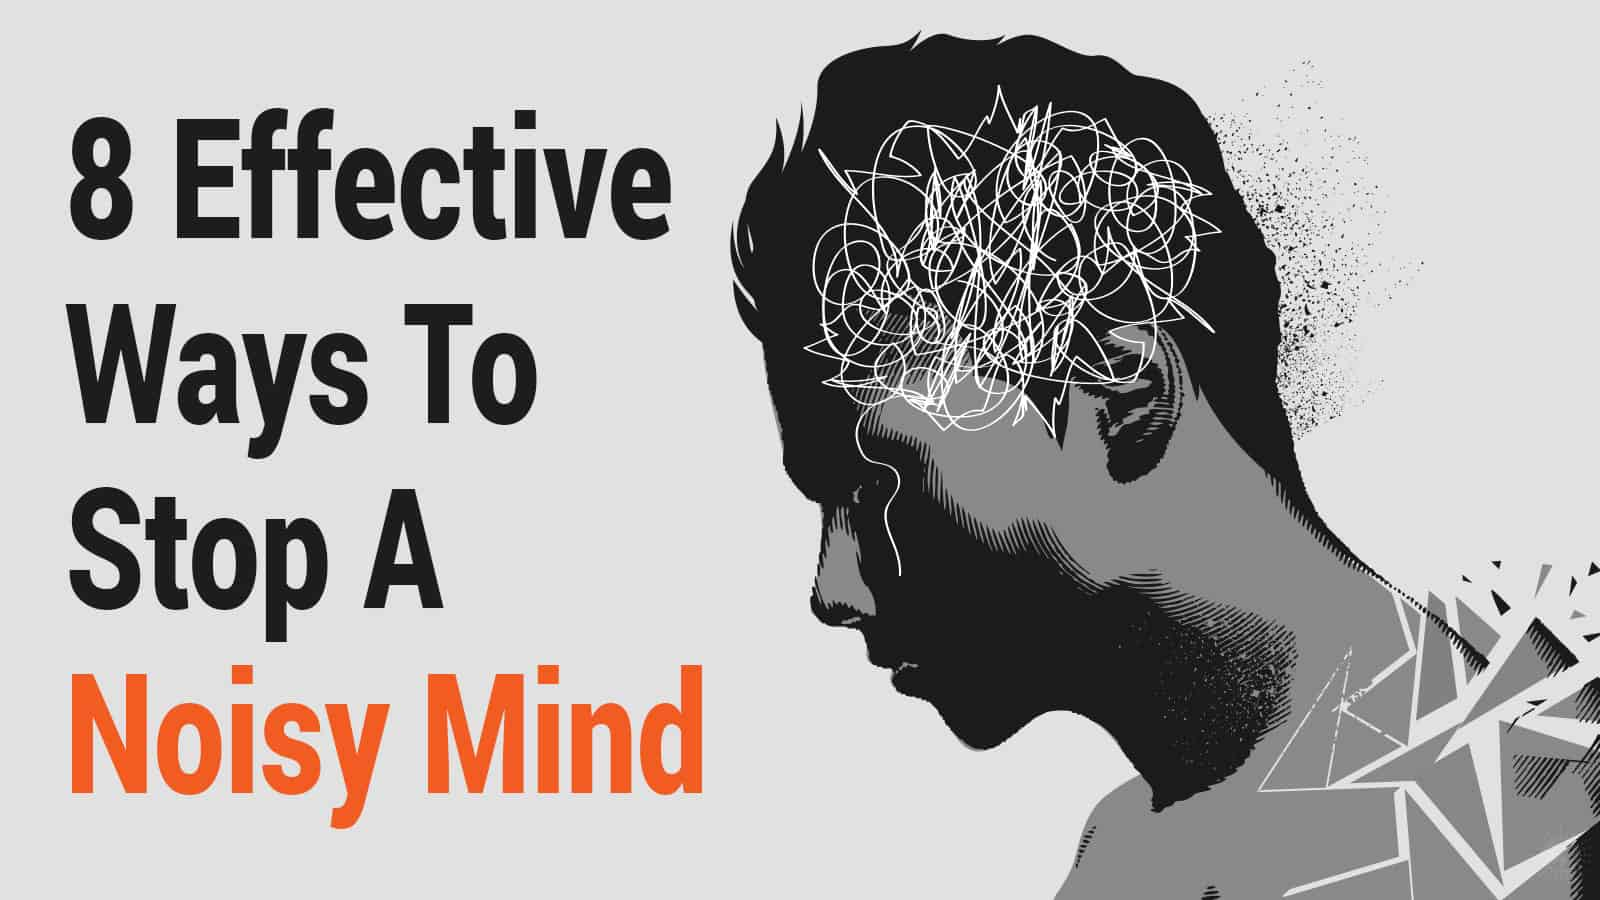 8-Effective-Ways-To-Stop-A-Noisy-Mind2.jpg